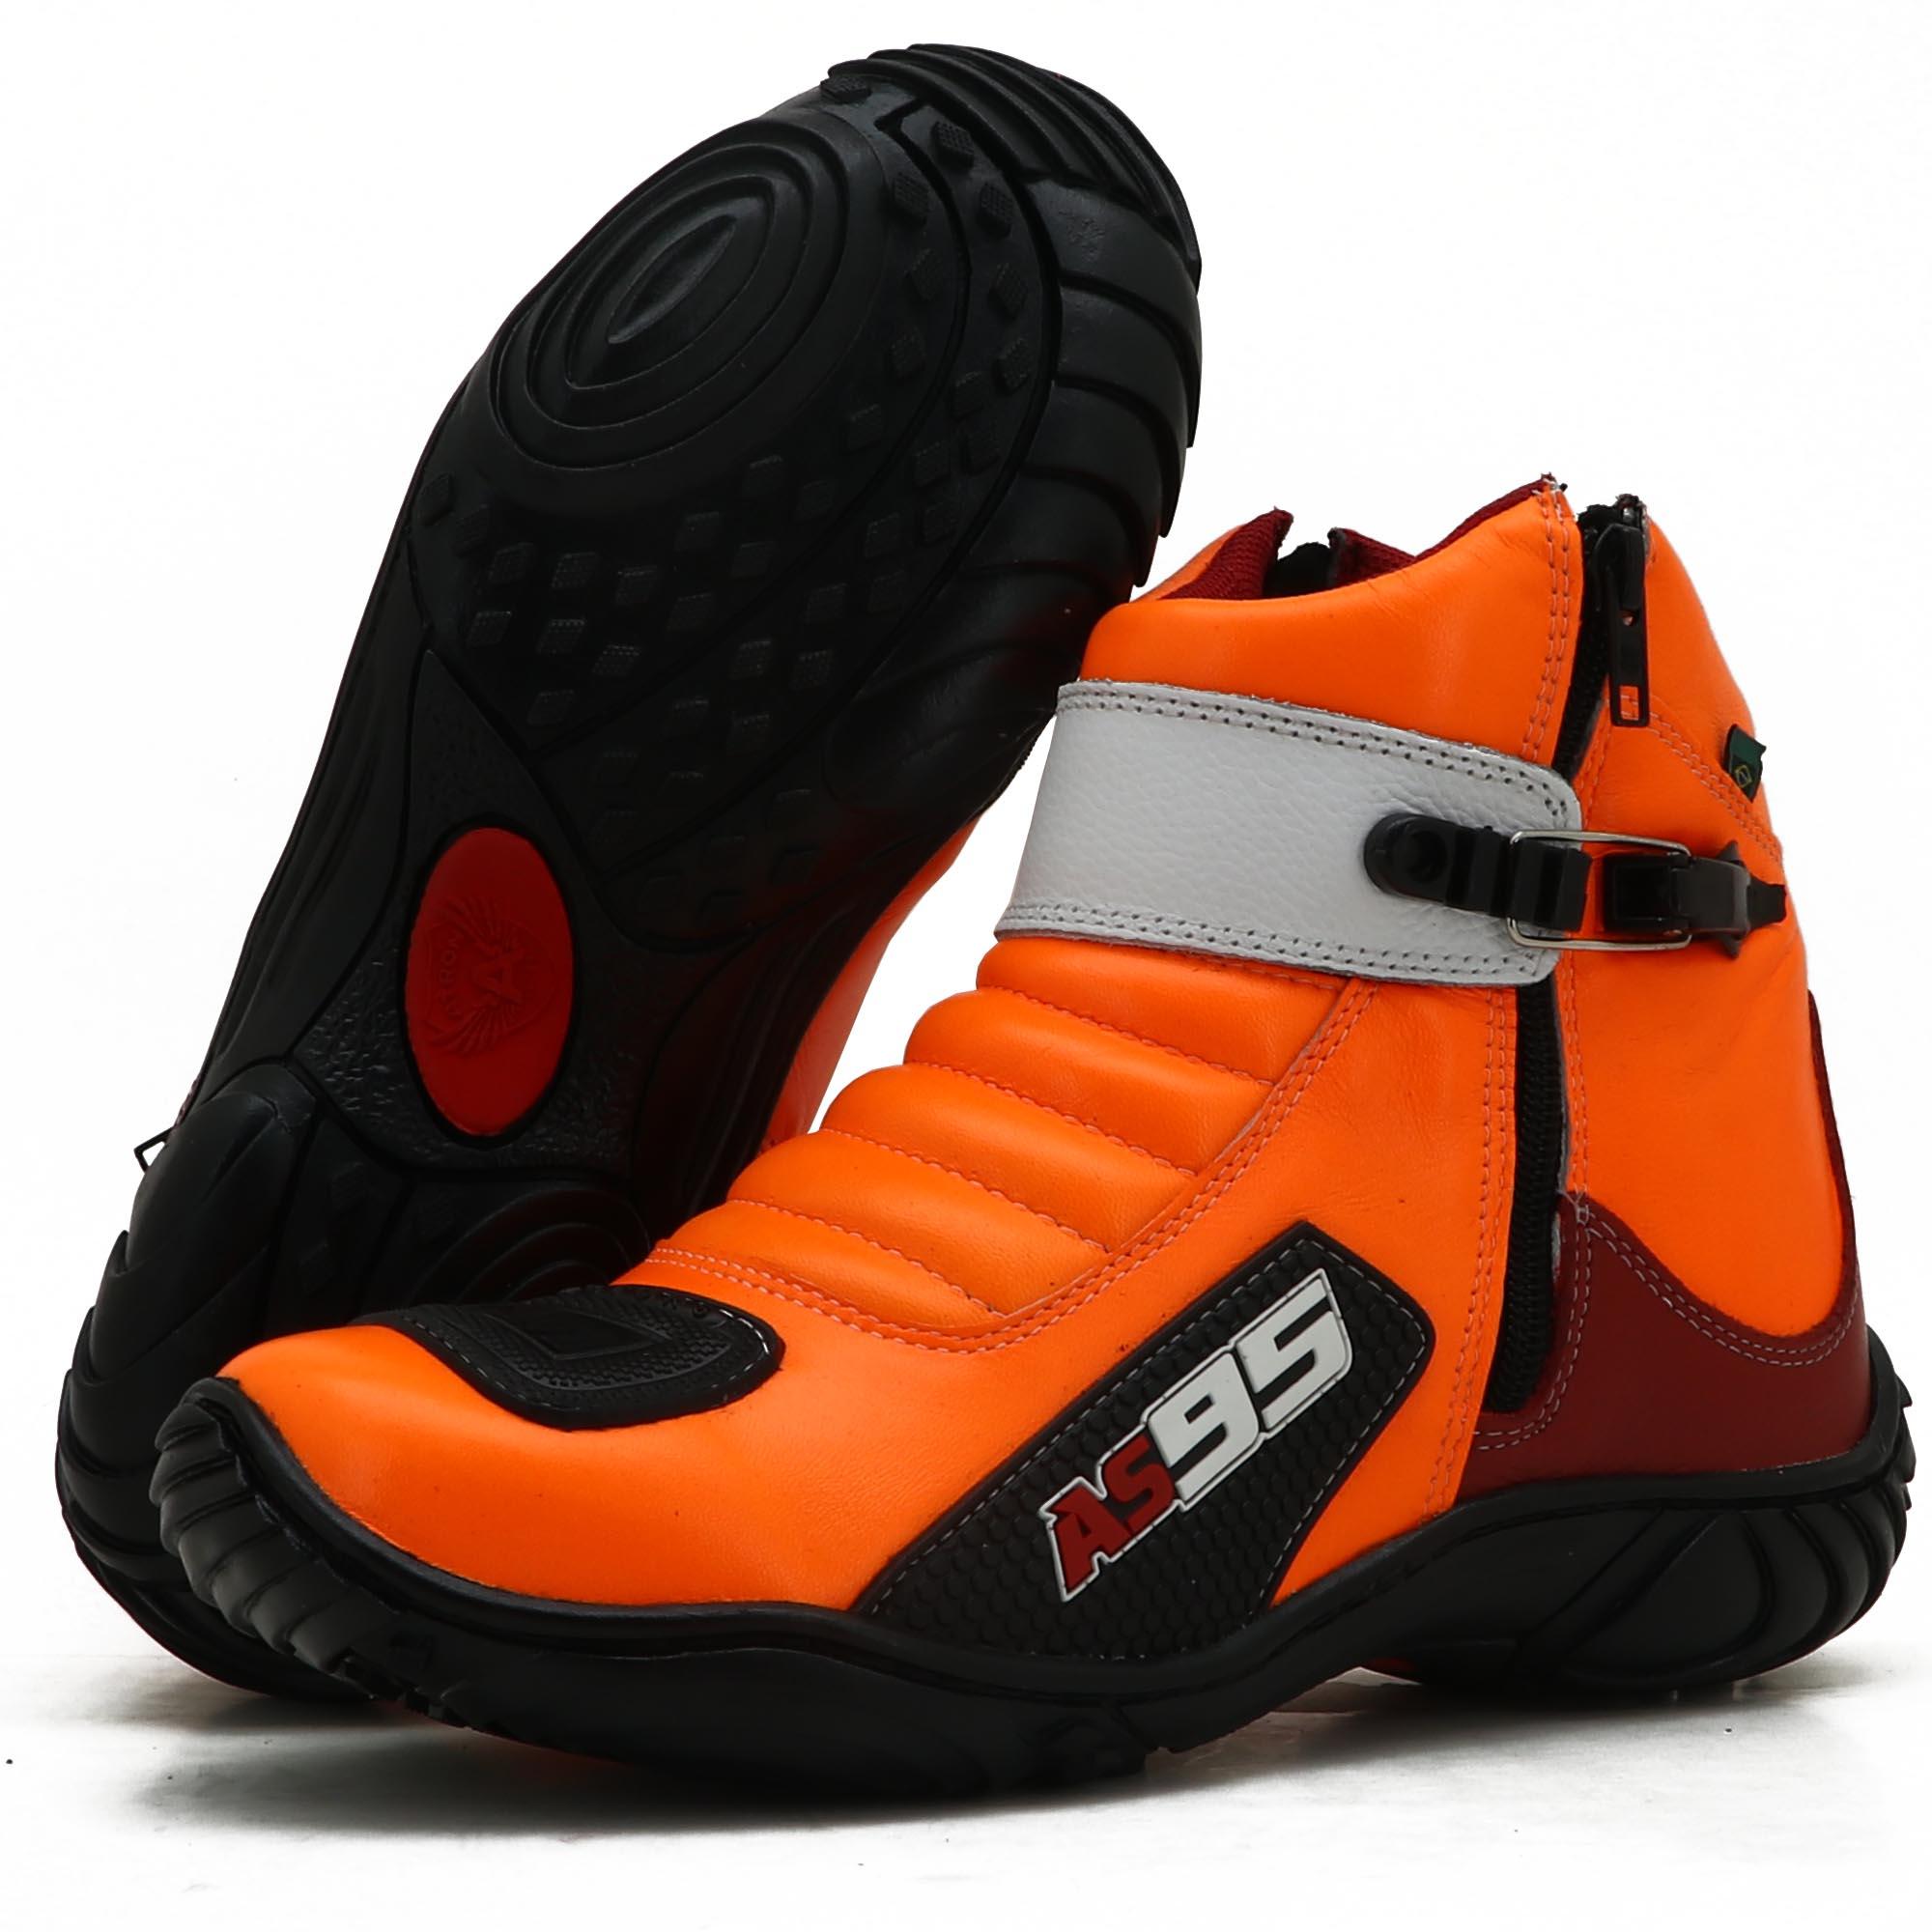 Bota Motociclista Couro Legítimo Laranja Vermelho Branco AS95